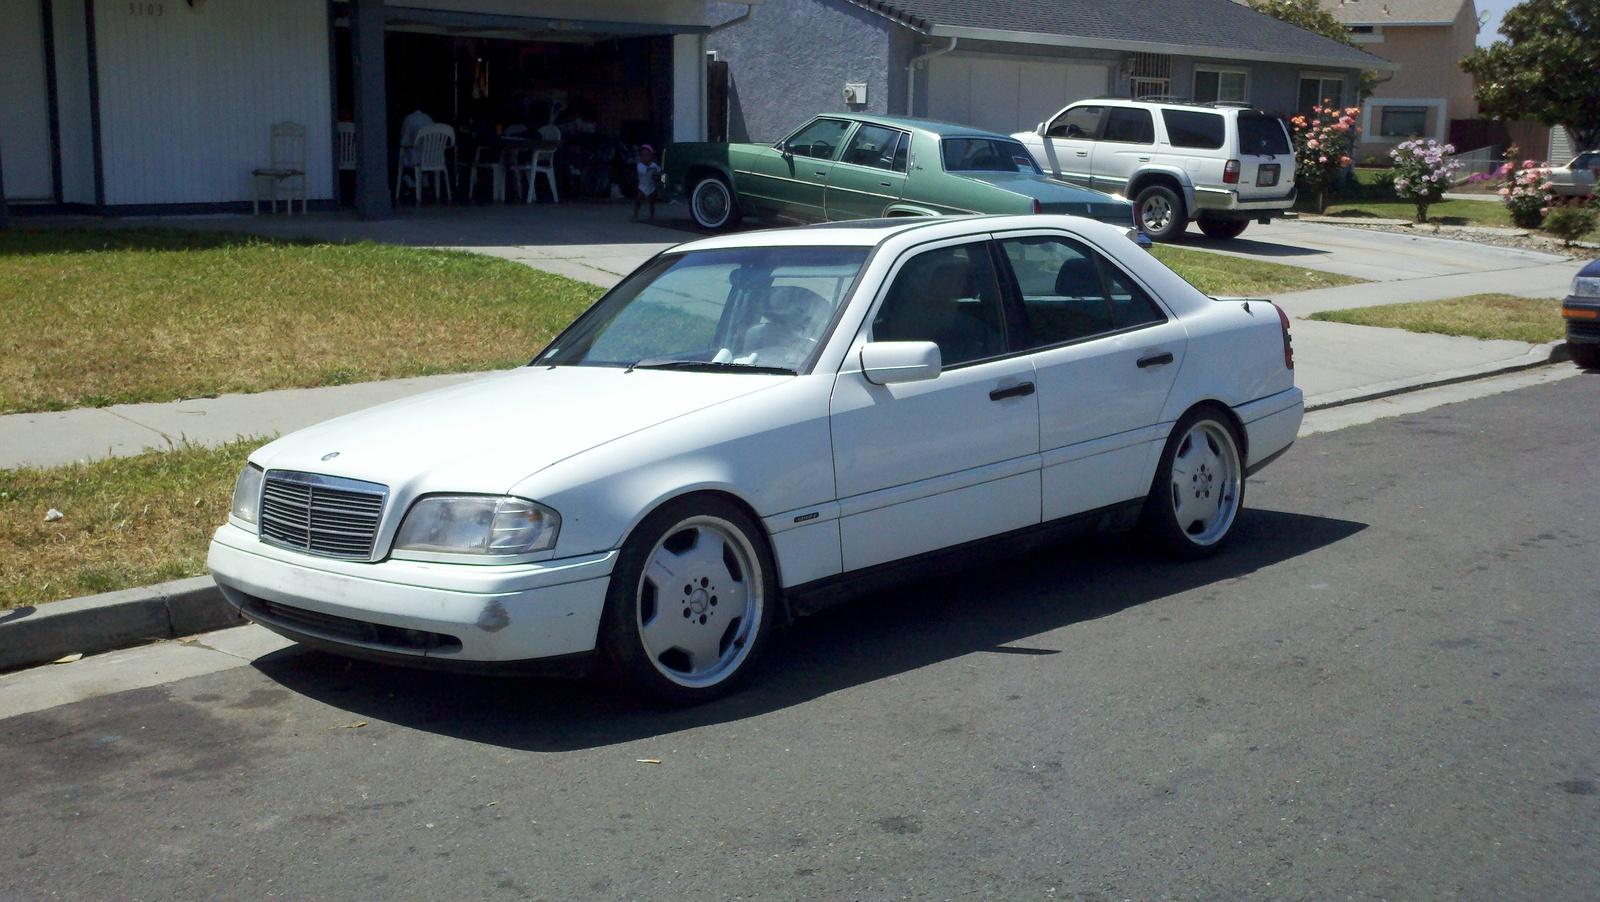 1997 mercedes benz c36 amg 9 mercedes benz c36 amg 9